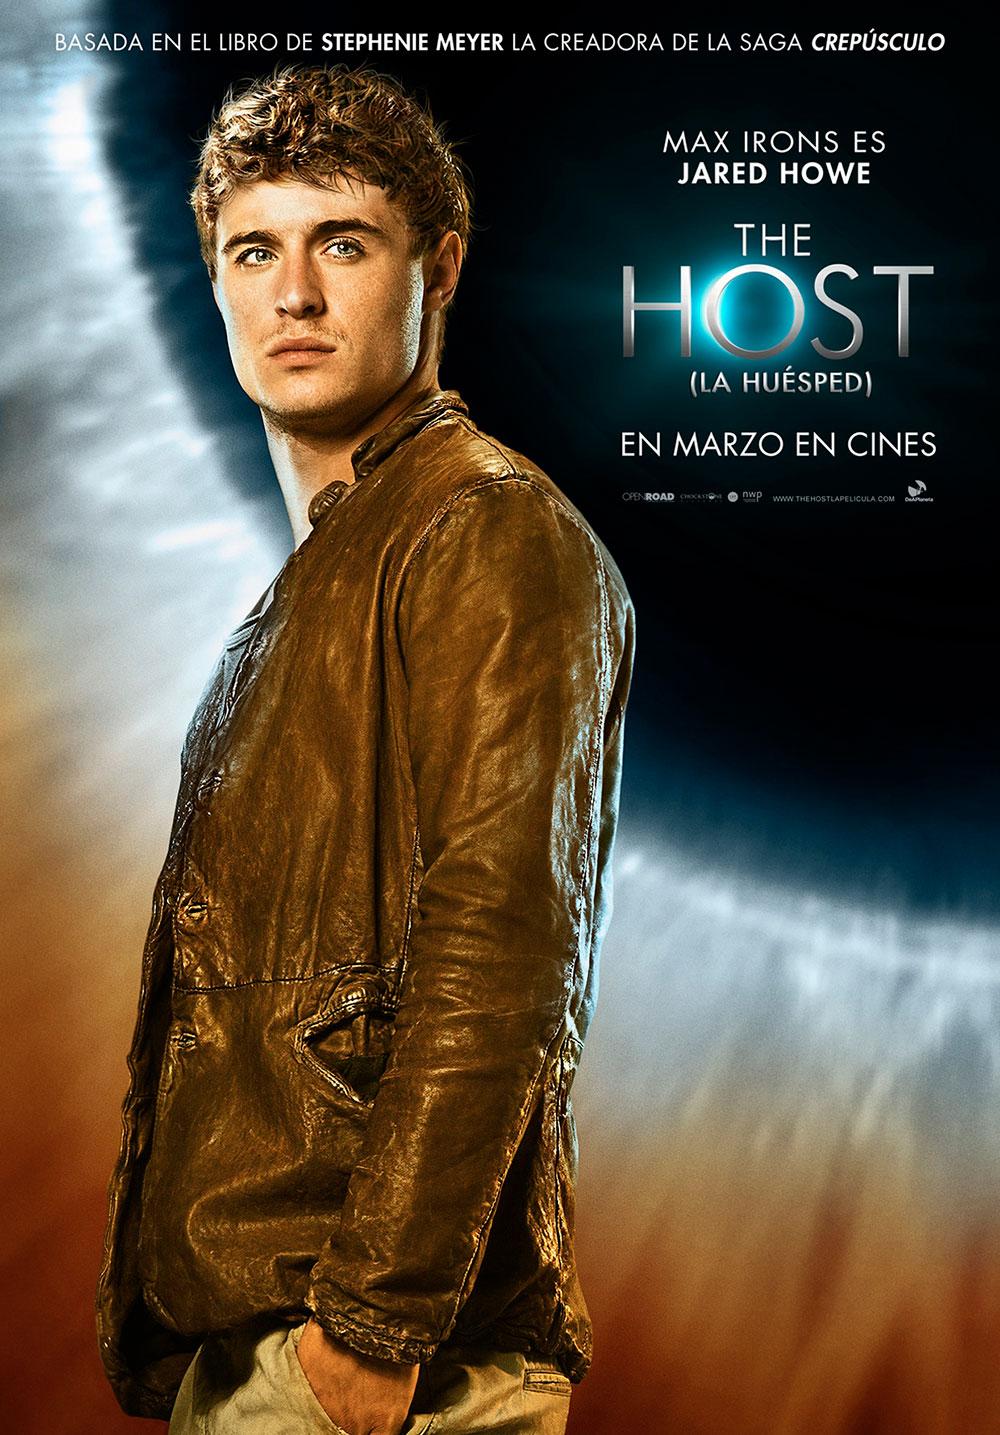 The Host. Poster de Max Irons como Jared